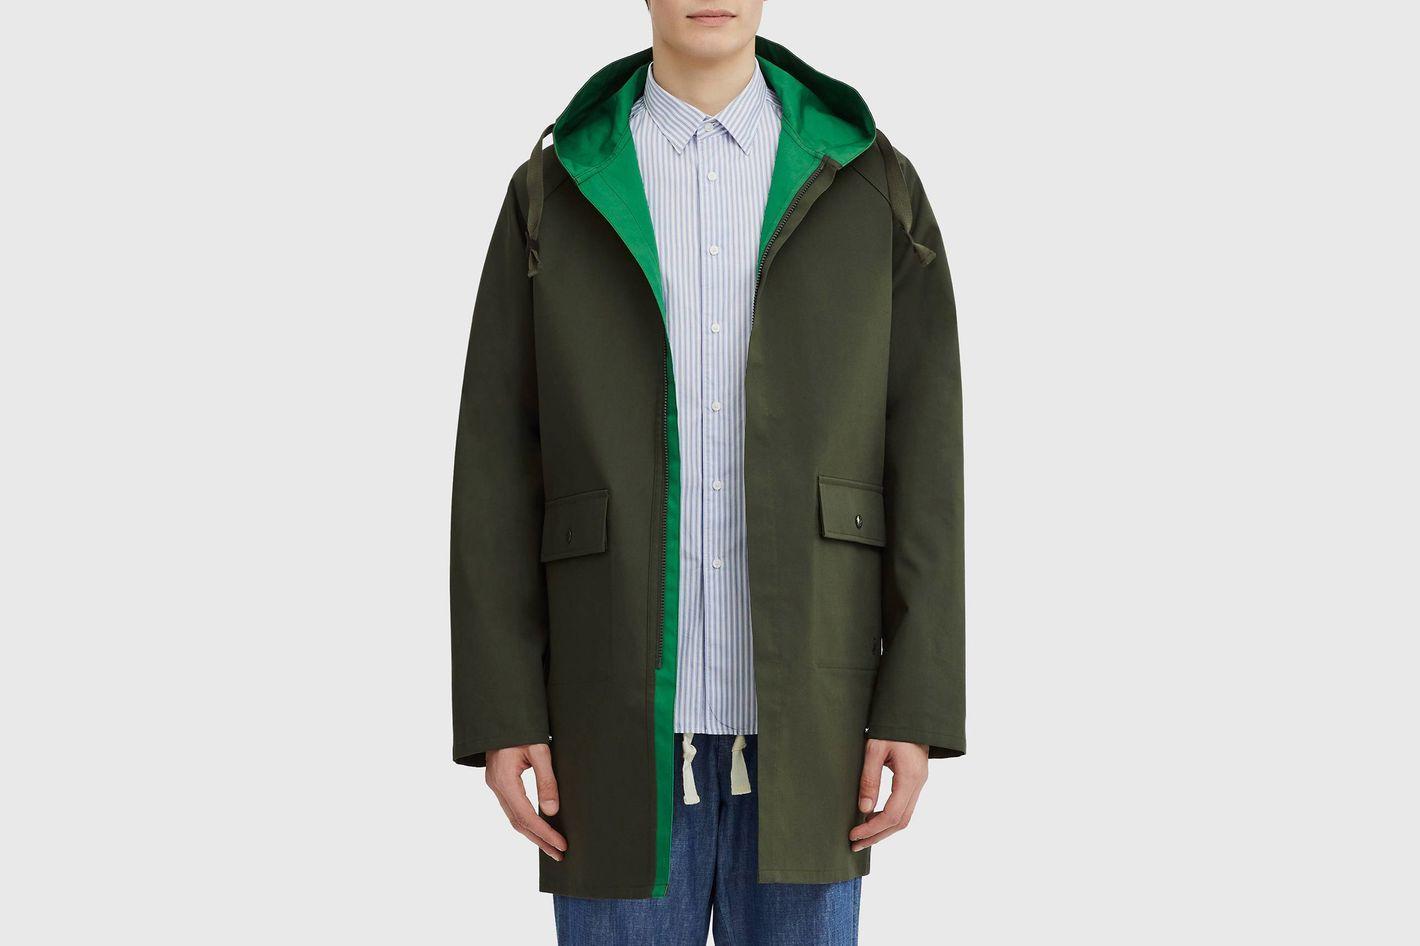 Uniqlo x JW Anderson Reversible Hooded Jacket